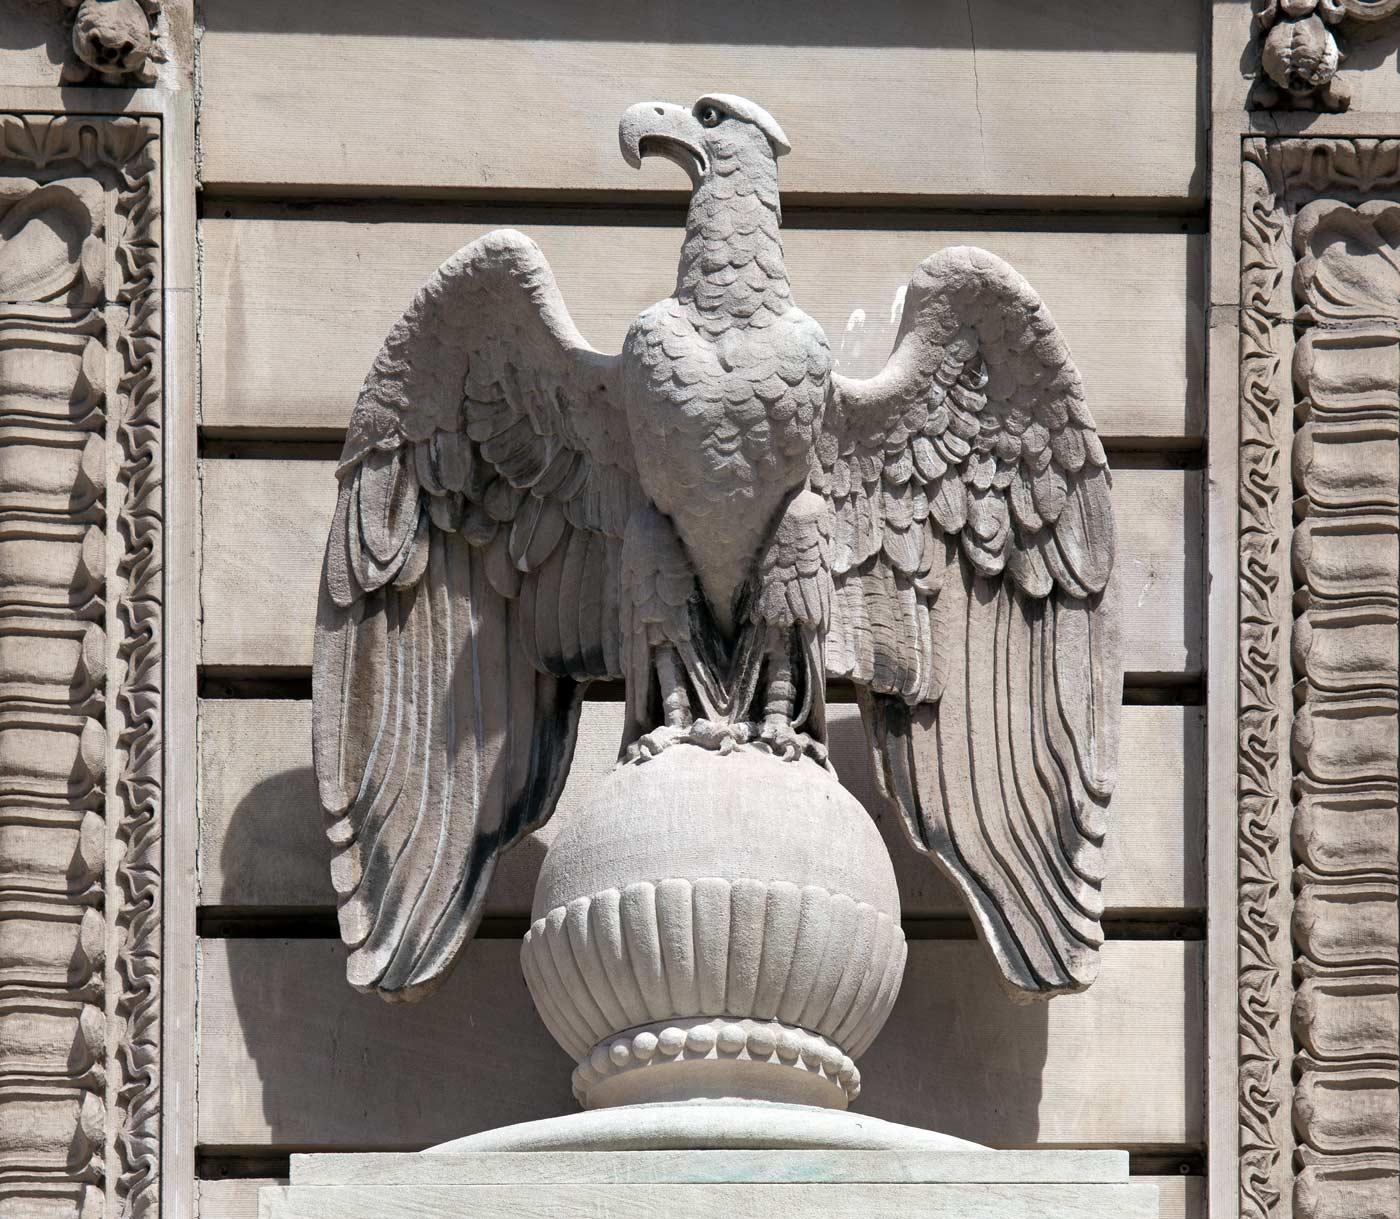 Art Deco Bald Eagle - Art Deco Bald Eagle - U.S. Courthouse, El Paso, Texas 1922 - Carol M. Highsmith